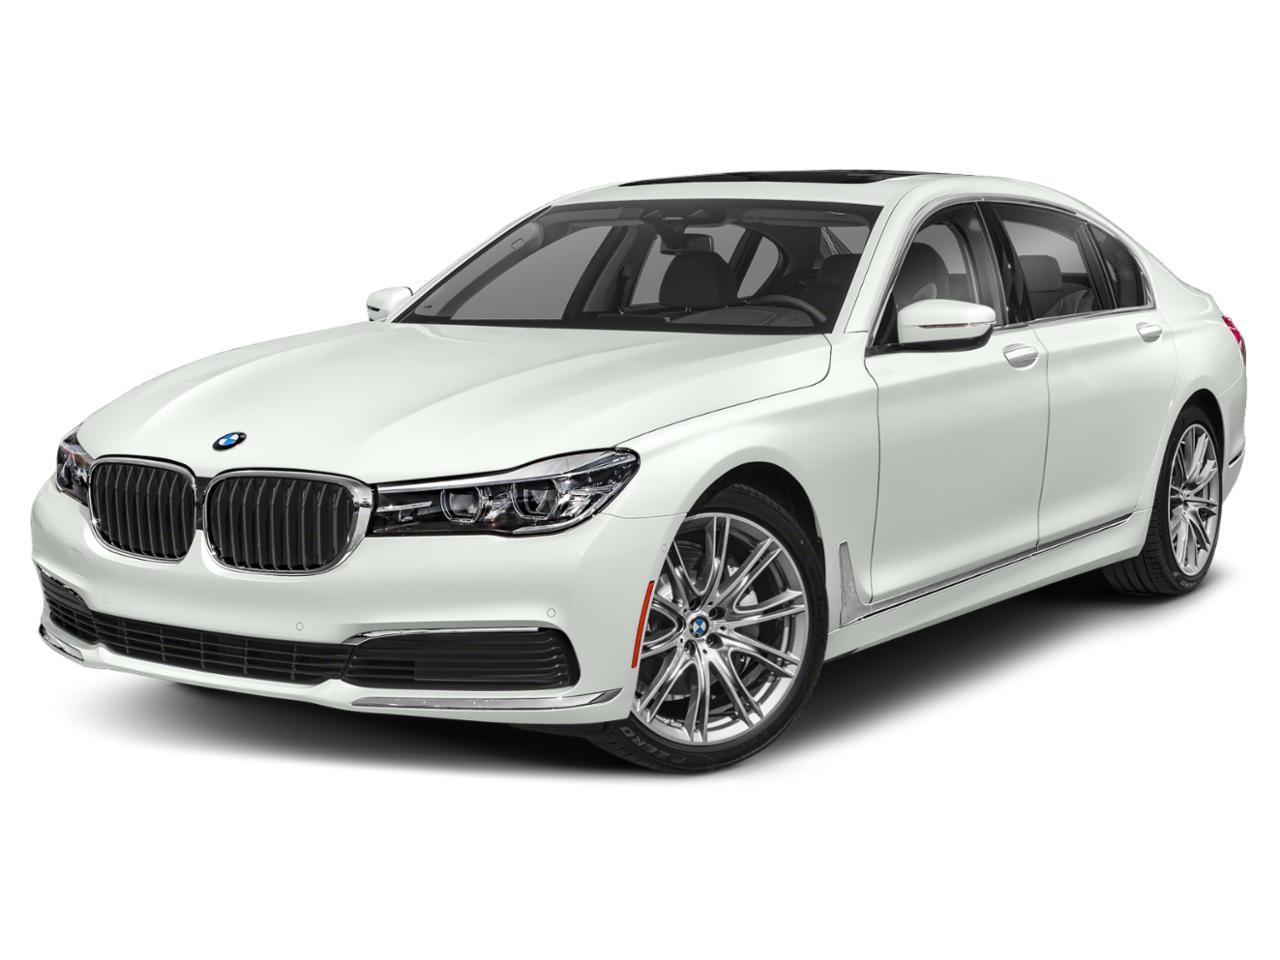 2019 BMW 740i Vehicle Photo in Charleston, SC 29407